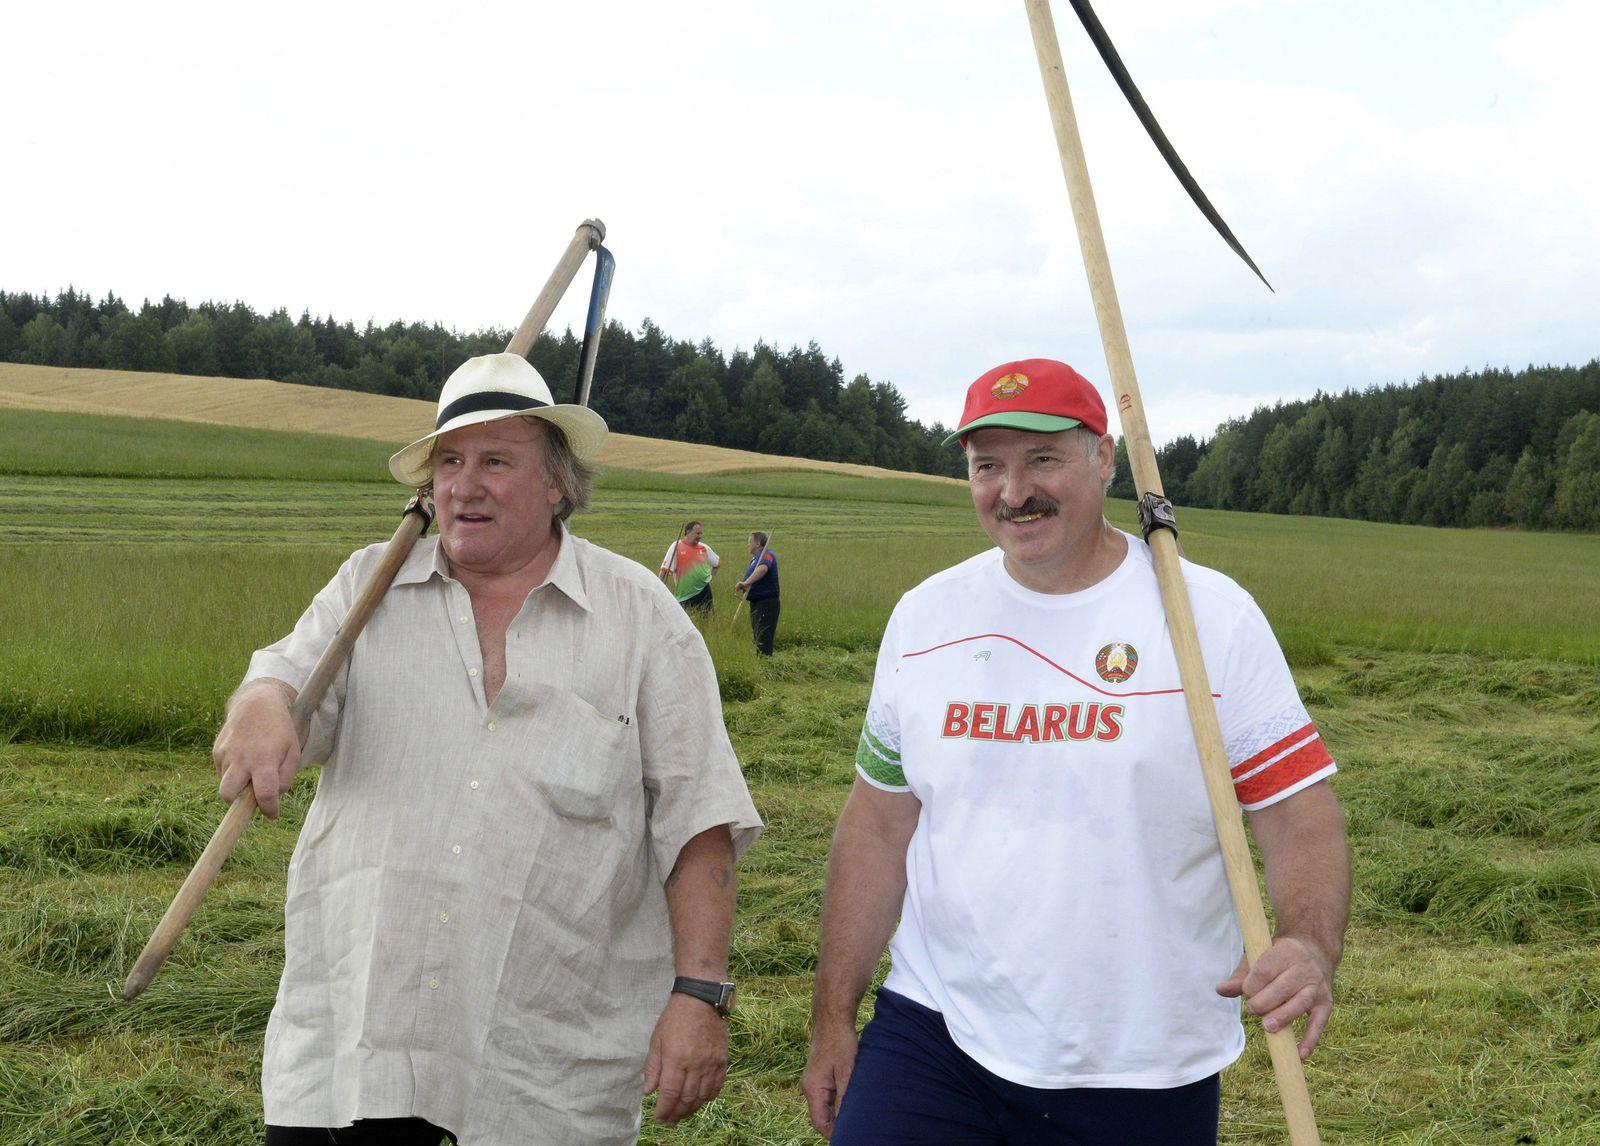 Alexander Lukashenko/ Gerard Depardieu